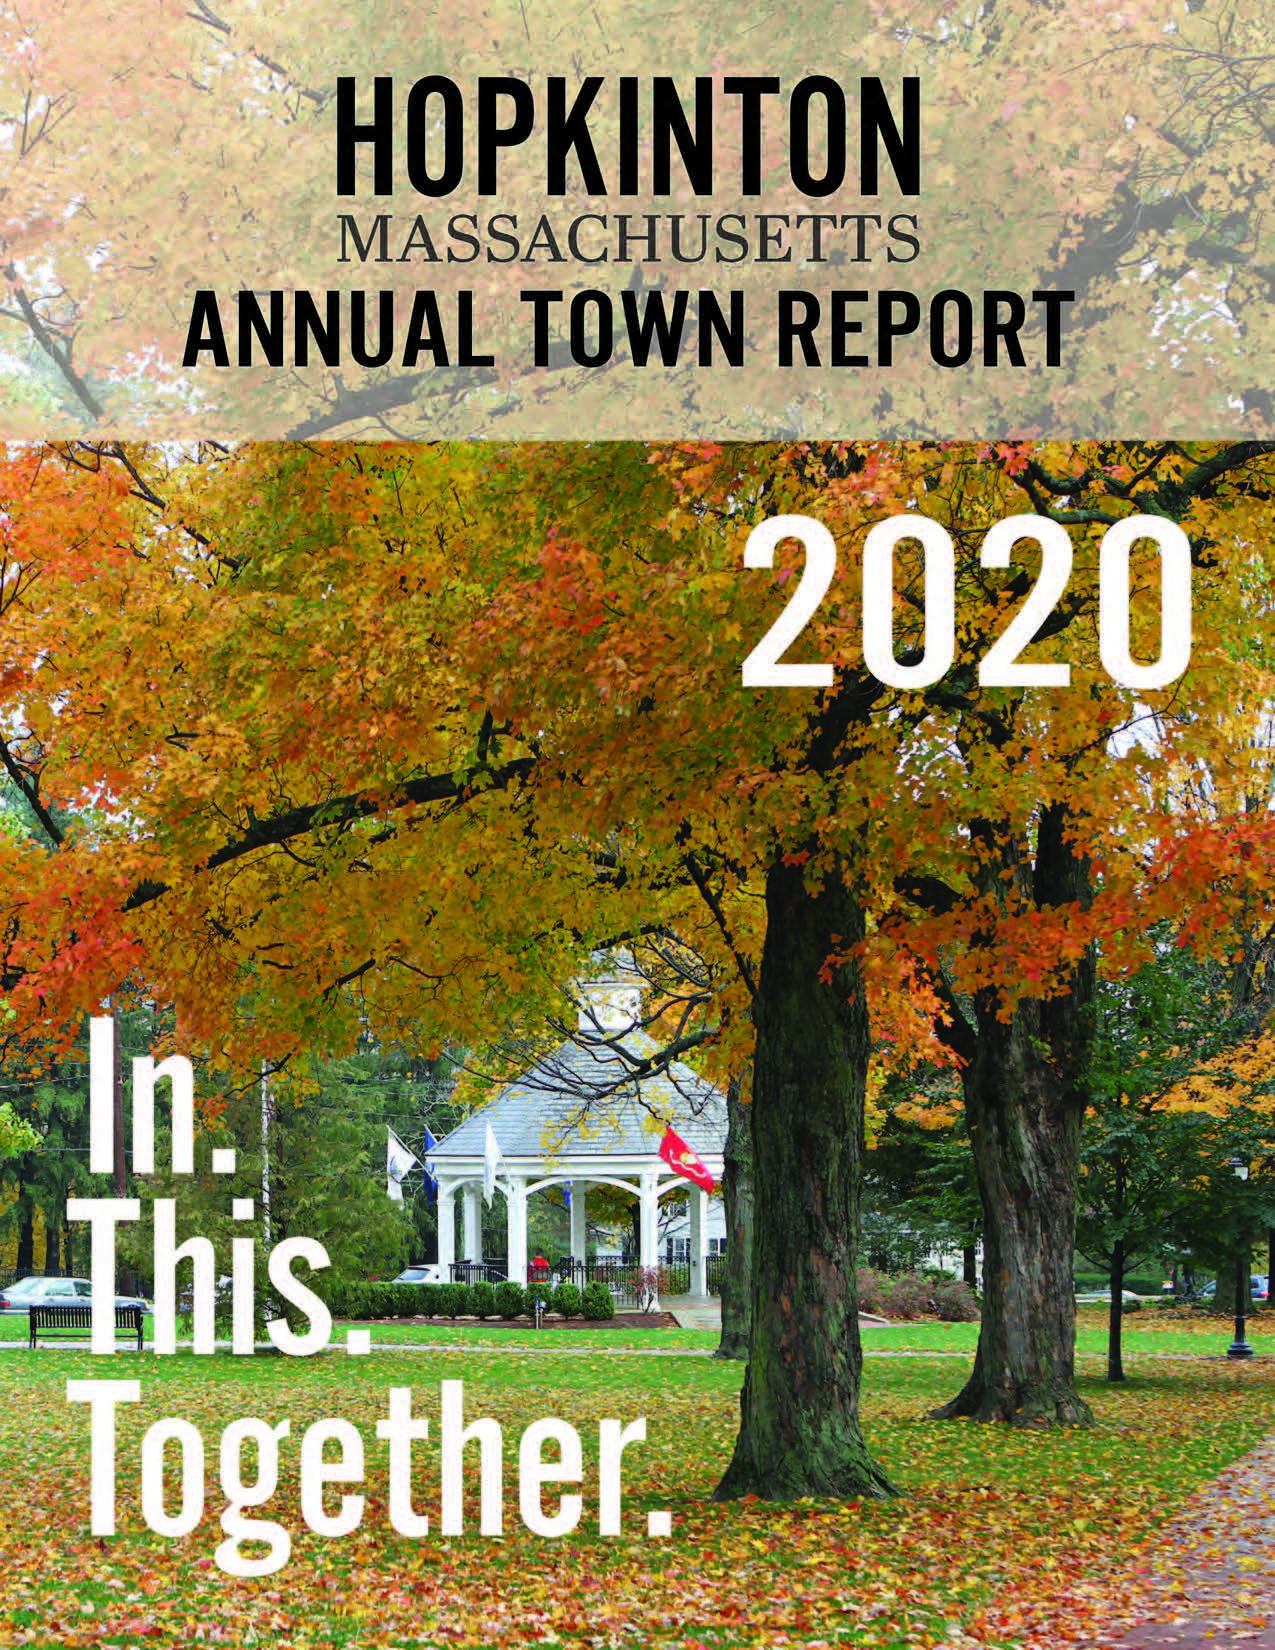 2020 Hopkinton Annual Town Report Cover